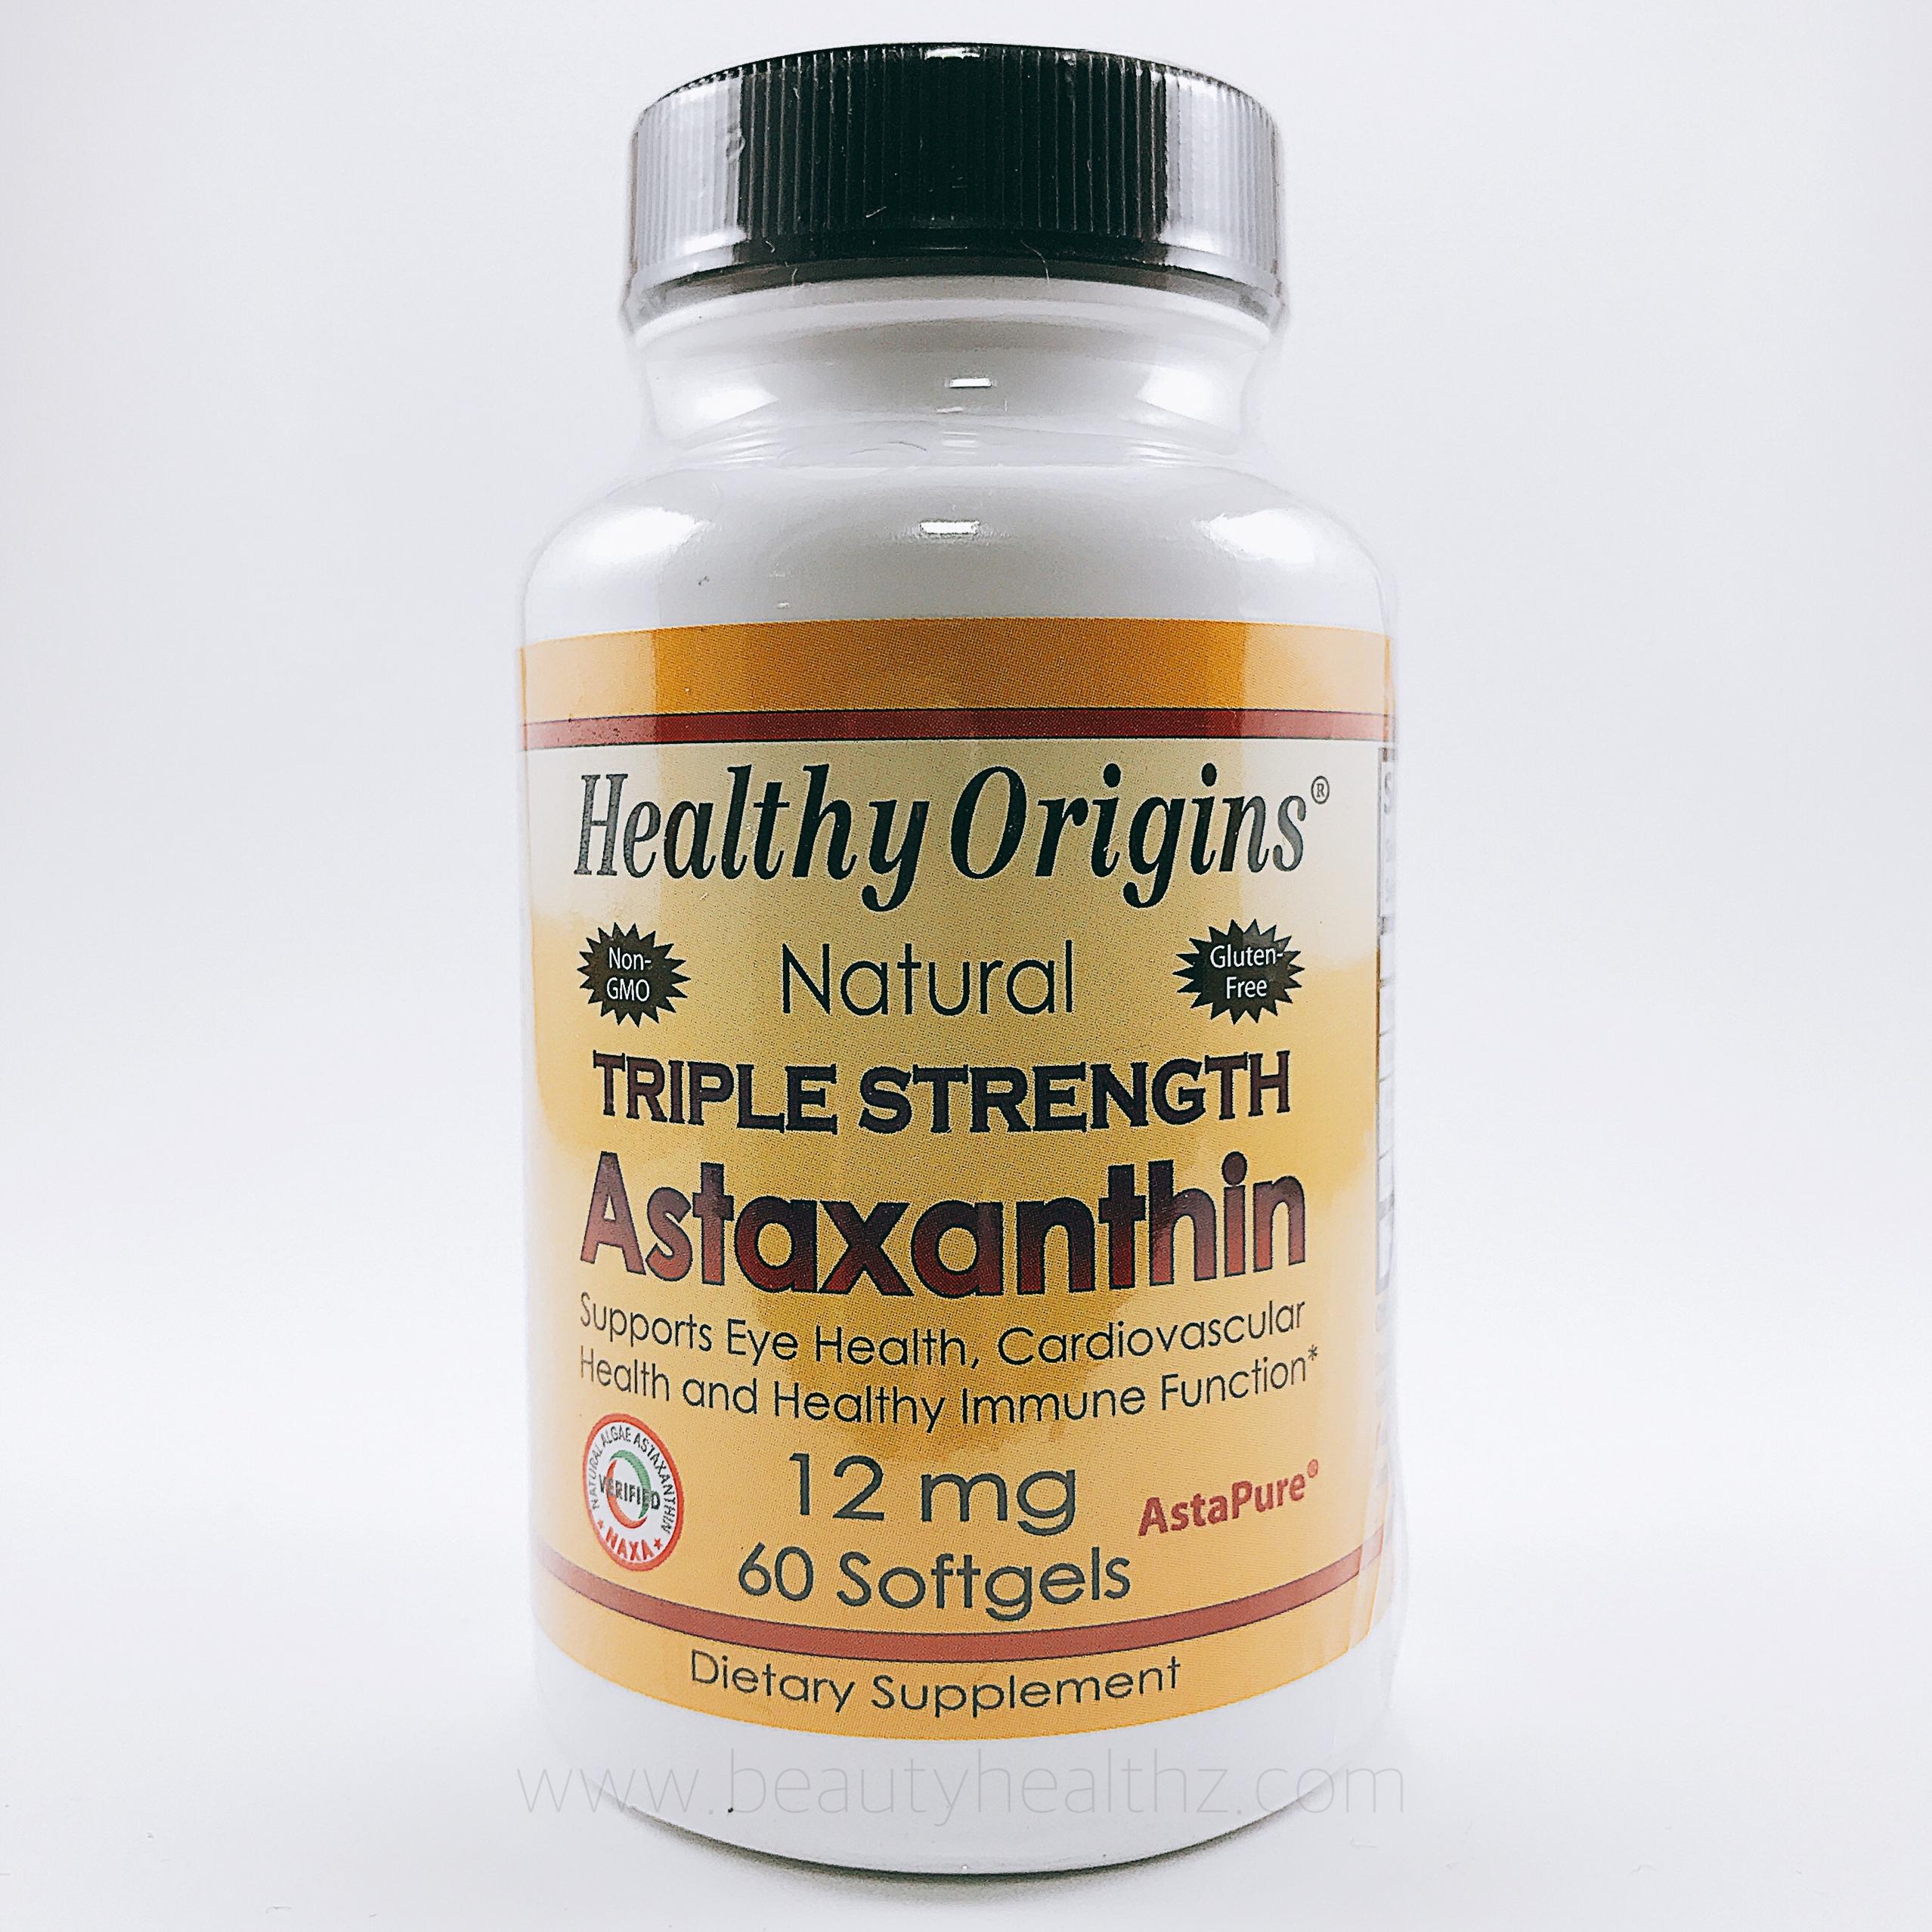 Healthy Origins, Natural Triple Strength Astaxanthin, 12 mg, 60 Softgels